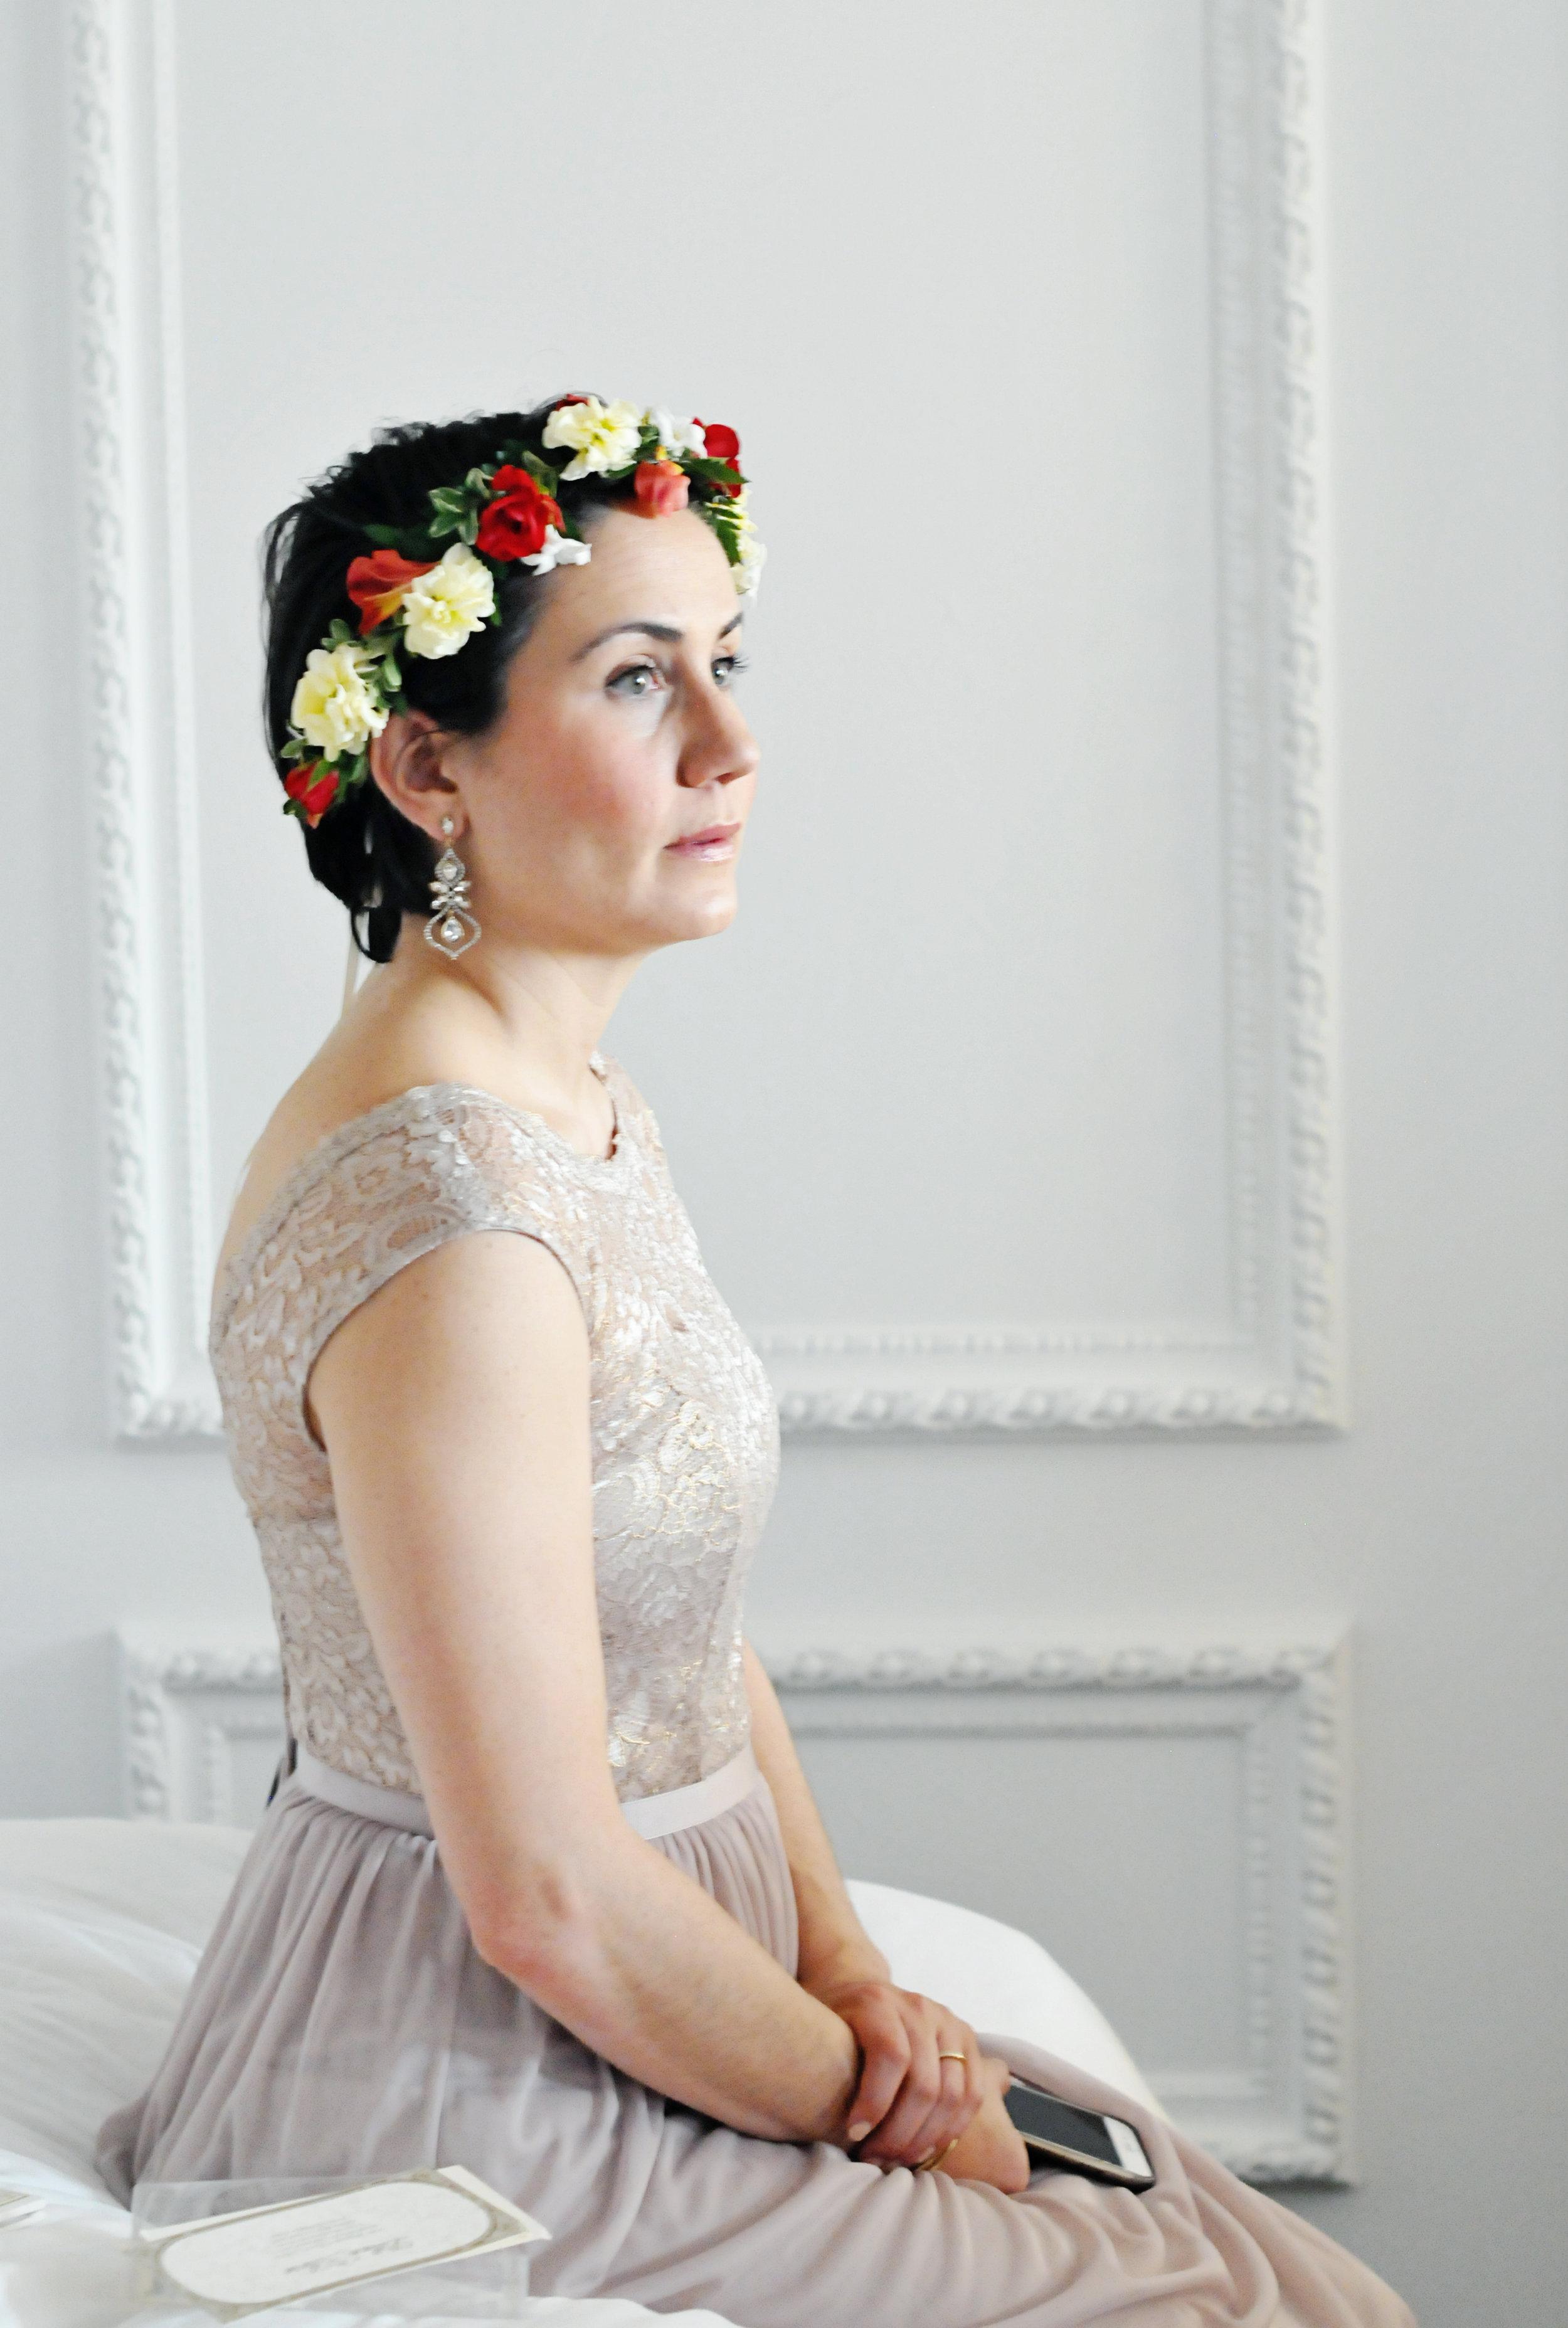 Partovi Wedding 2185 by maria pablo.jpg